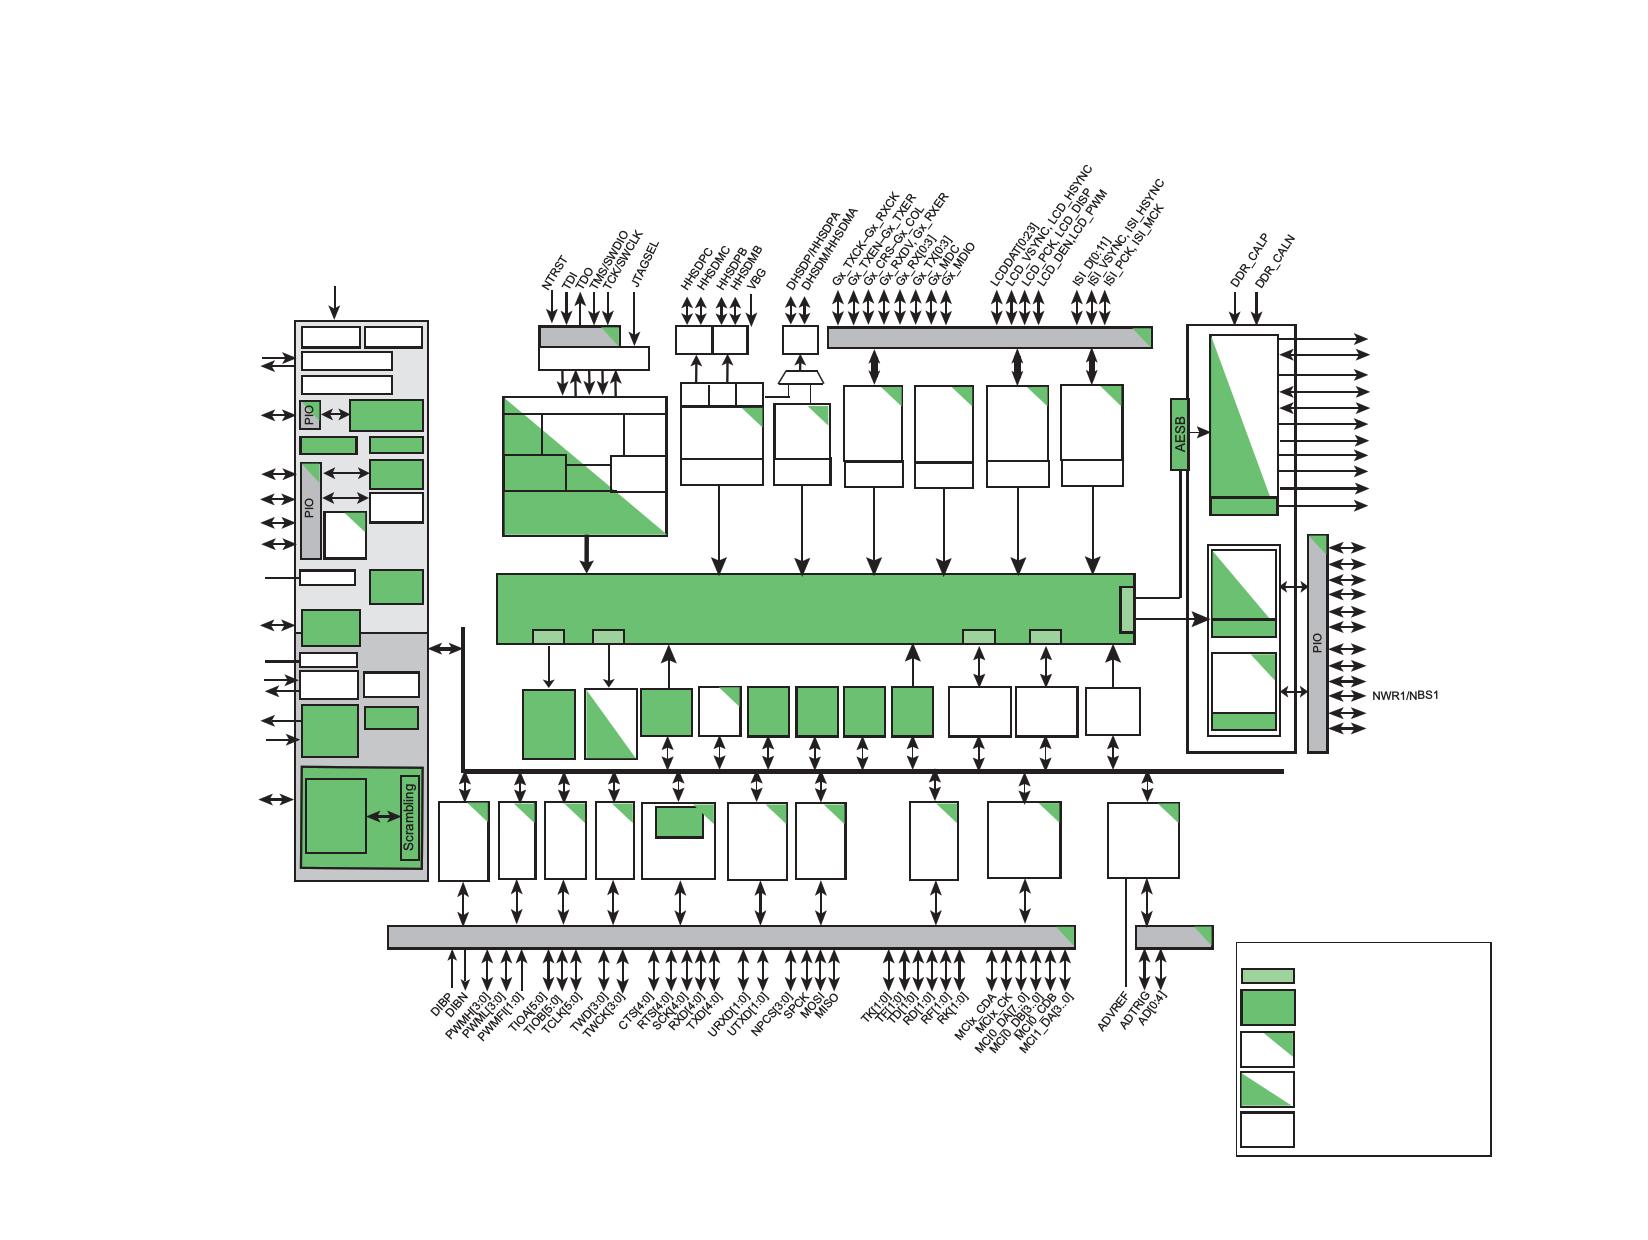 SAMA5D42 pdf, 반도체, 판매, 대치품